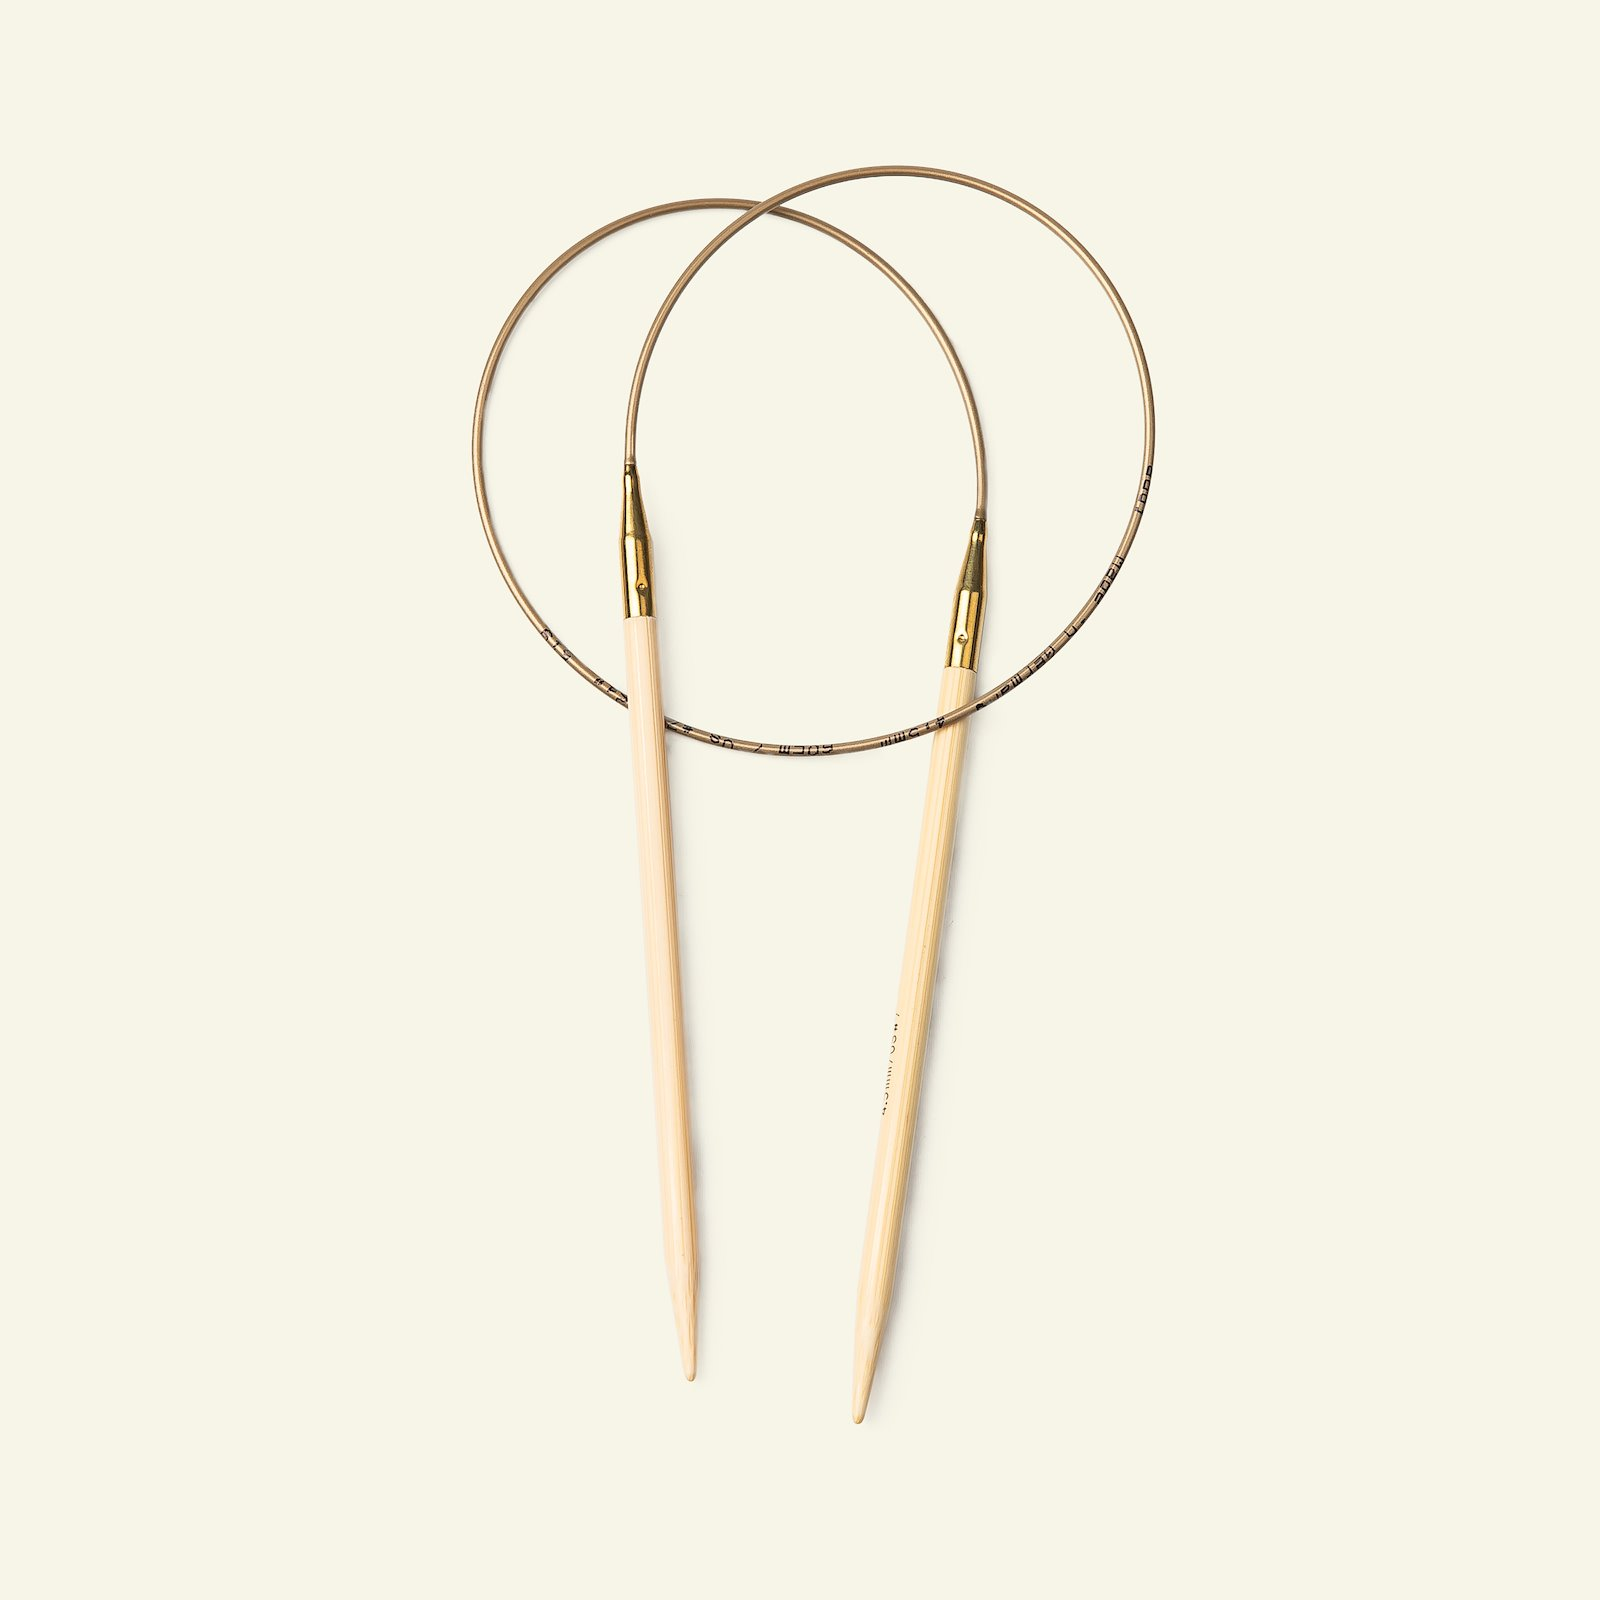 Addi circular needle bamboo 60cm 9mm 83119_pack